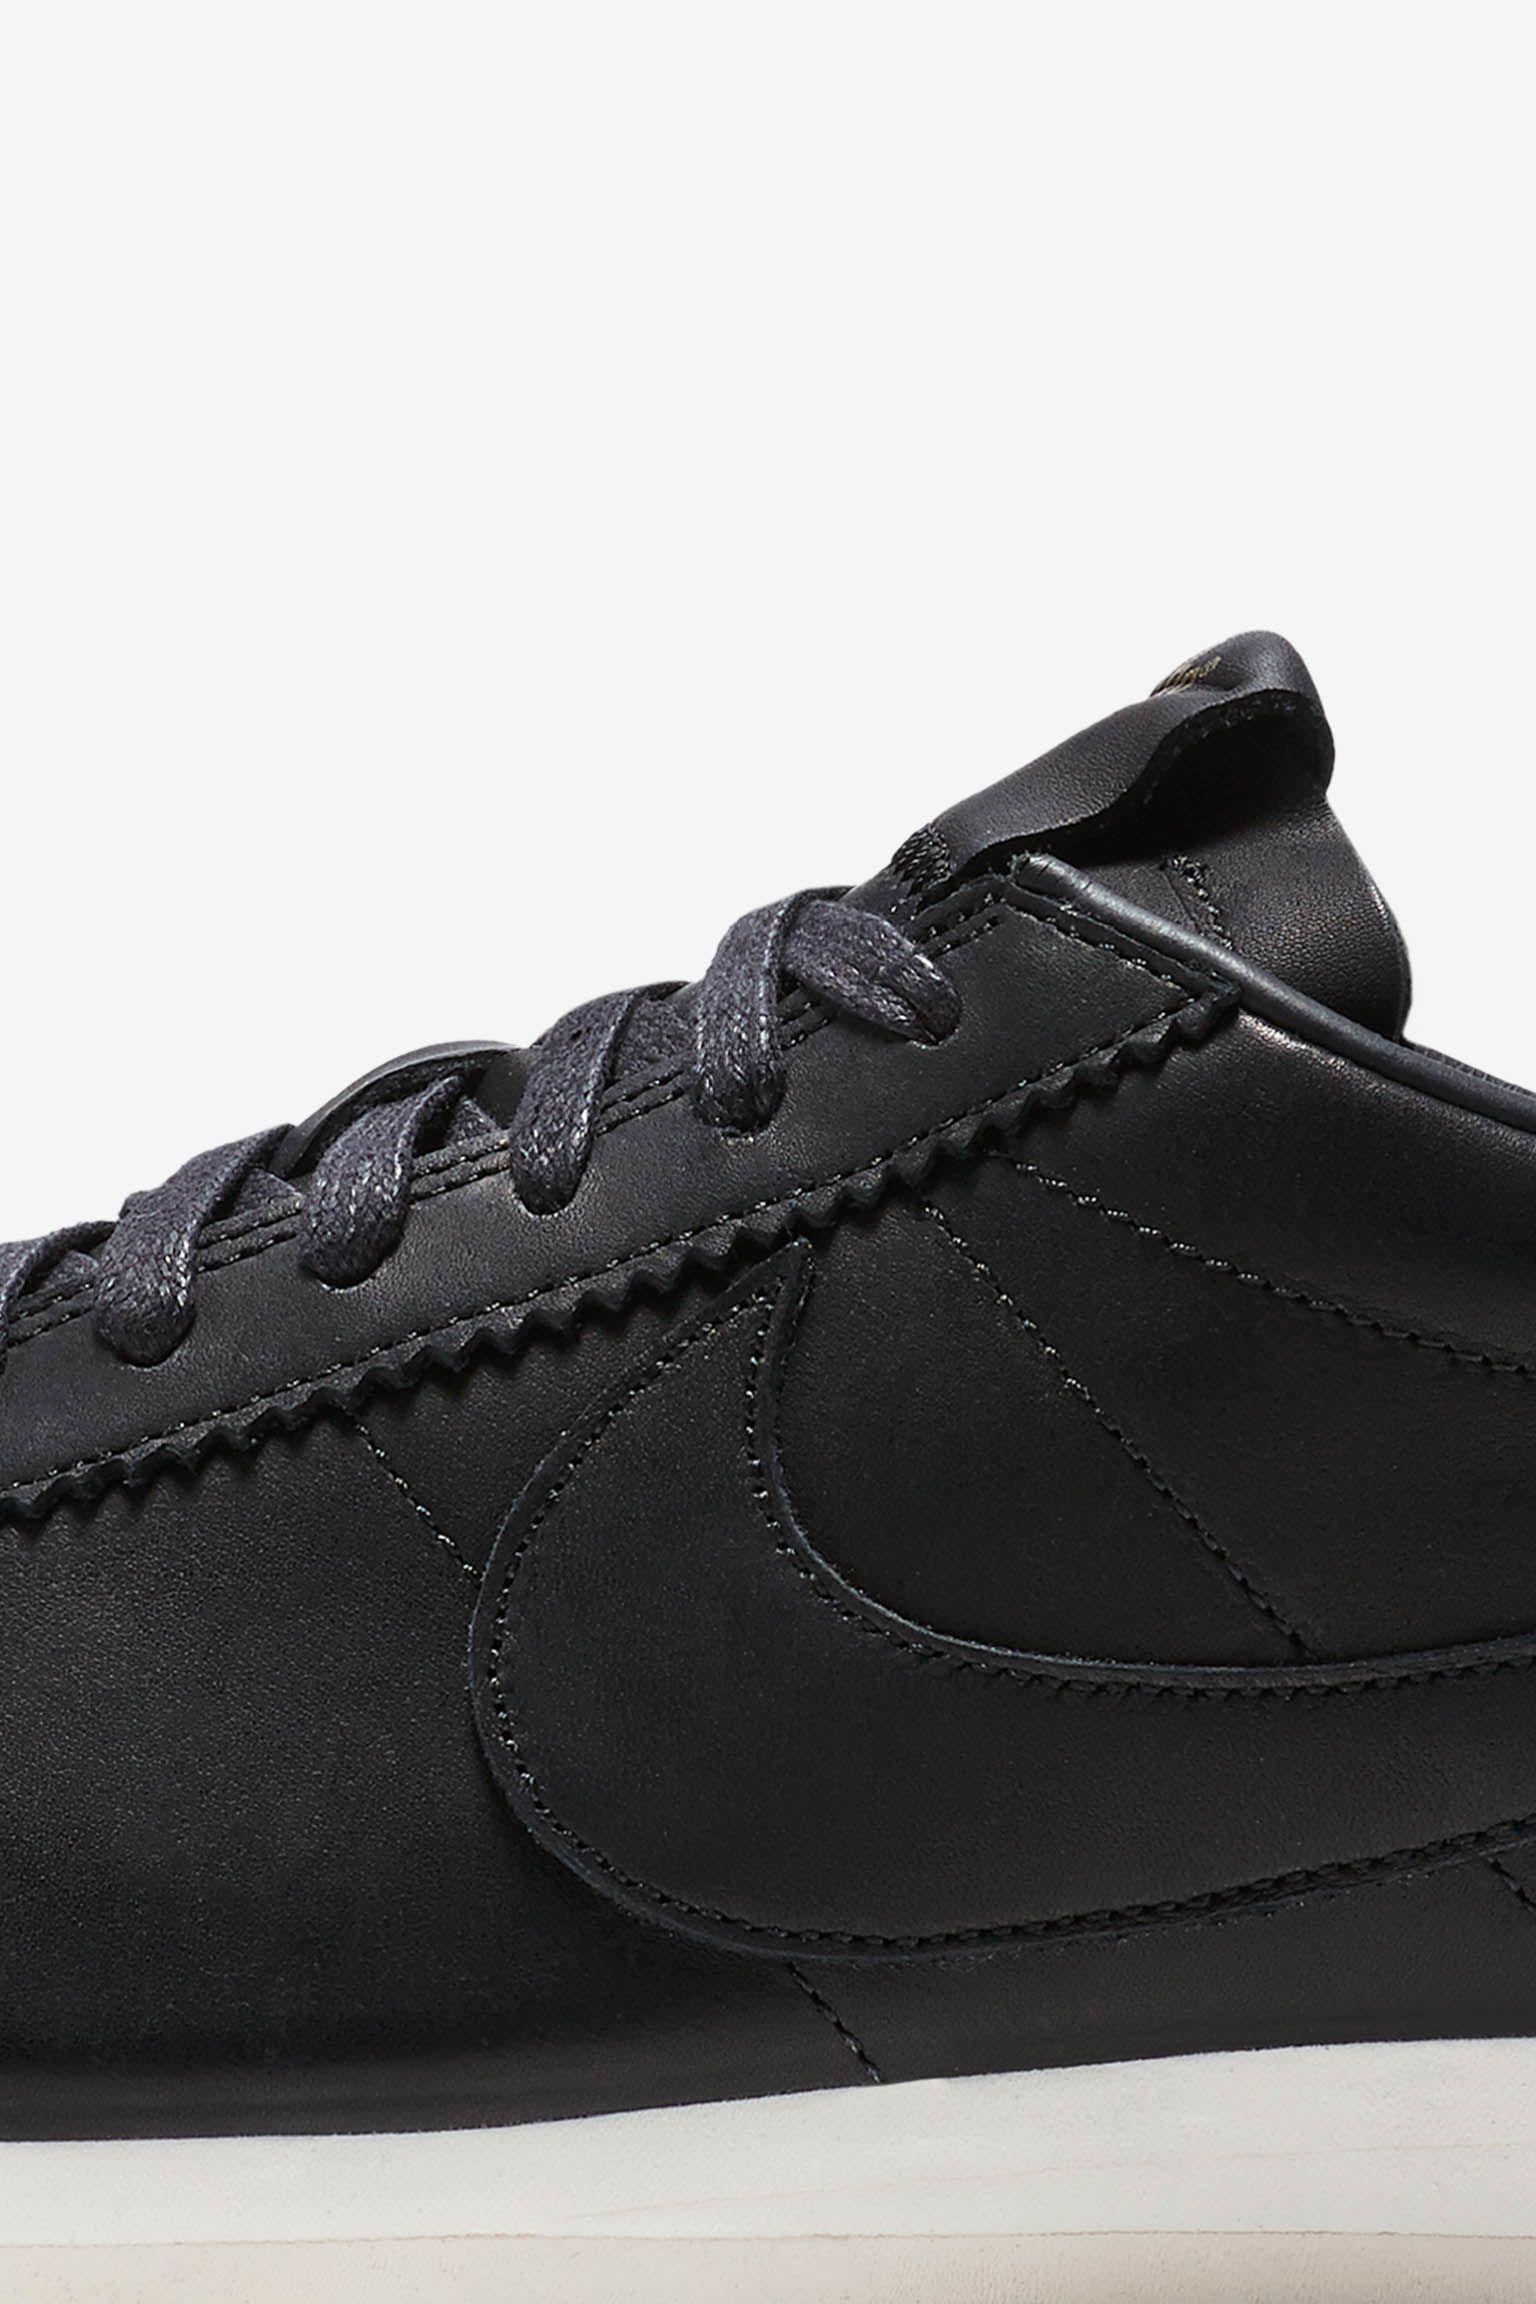 Nike Classic Cortez Premium 'Black & Sail'